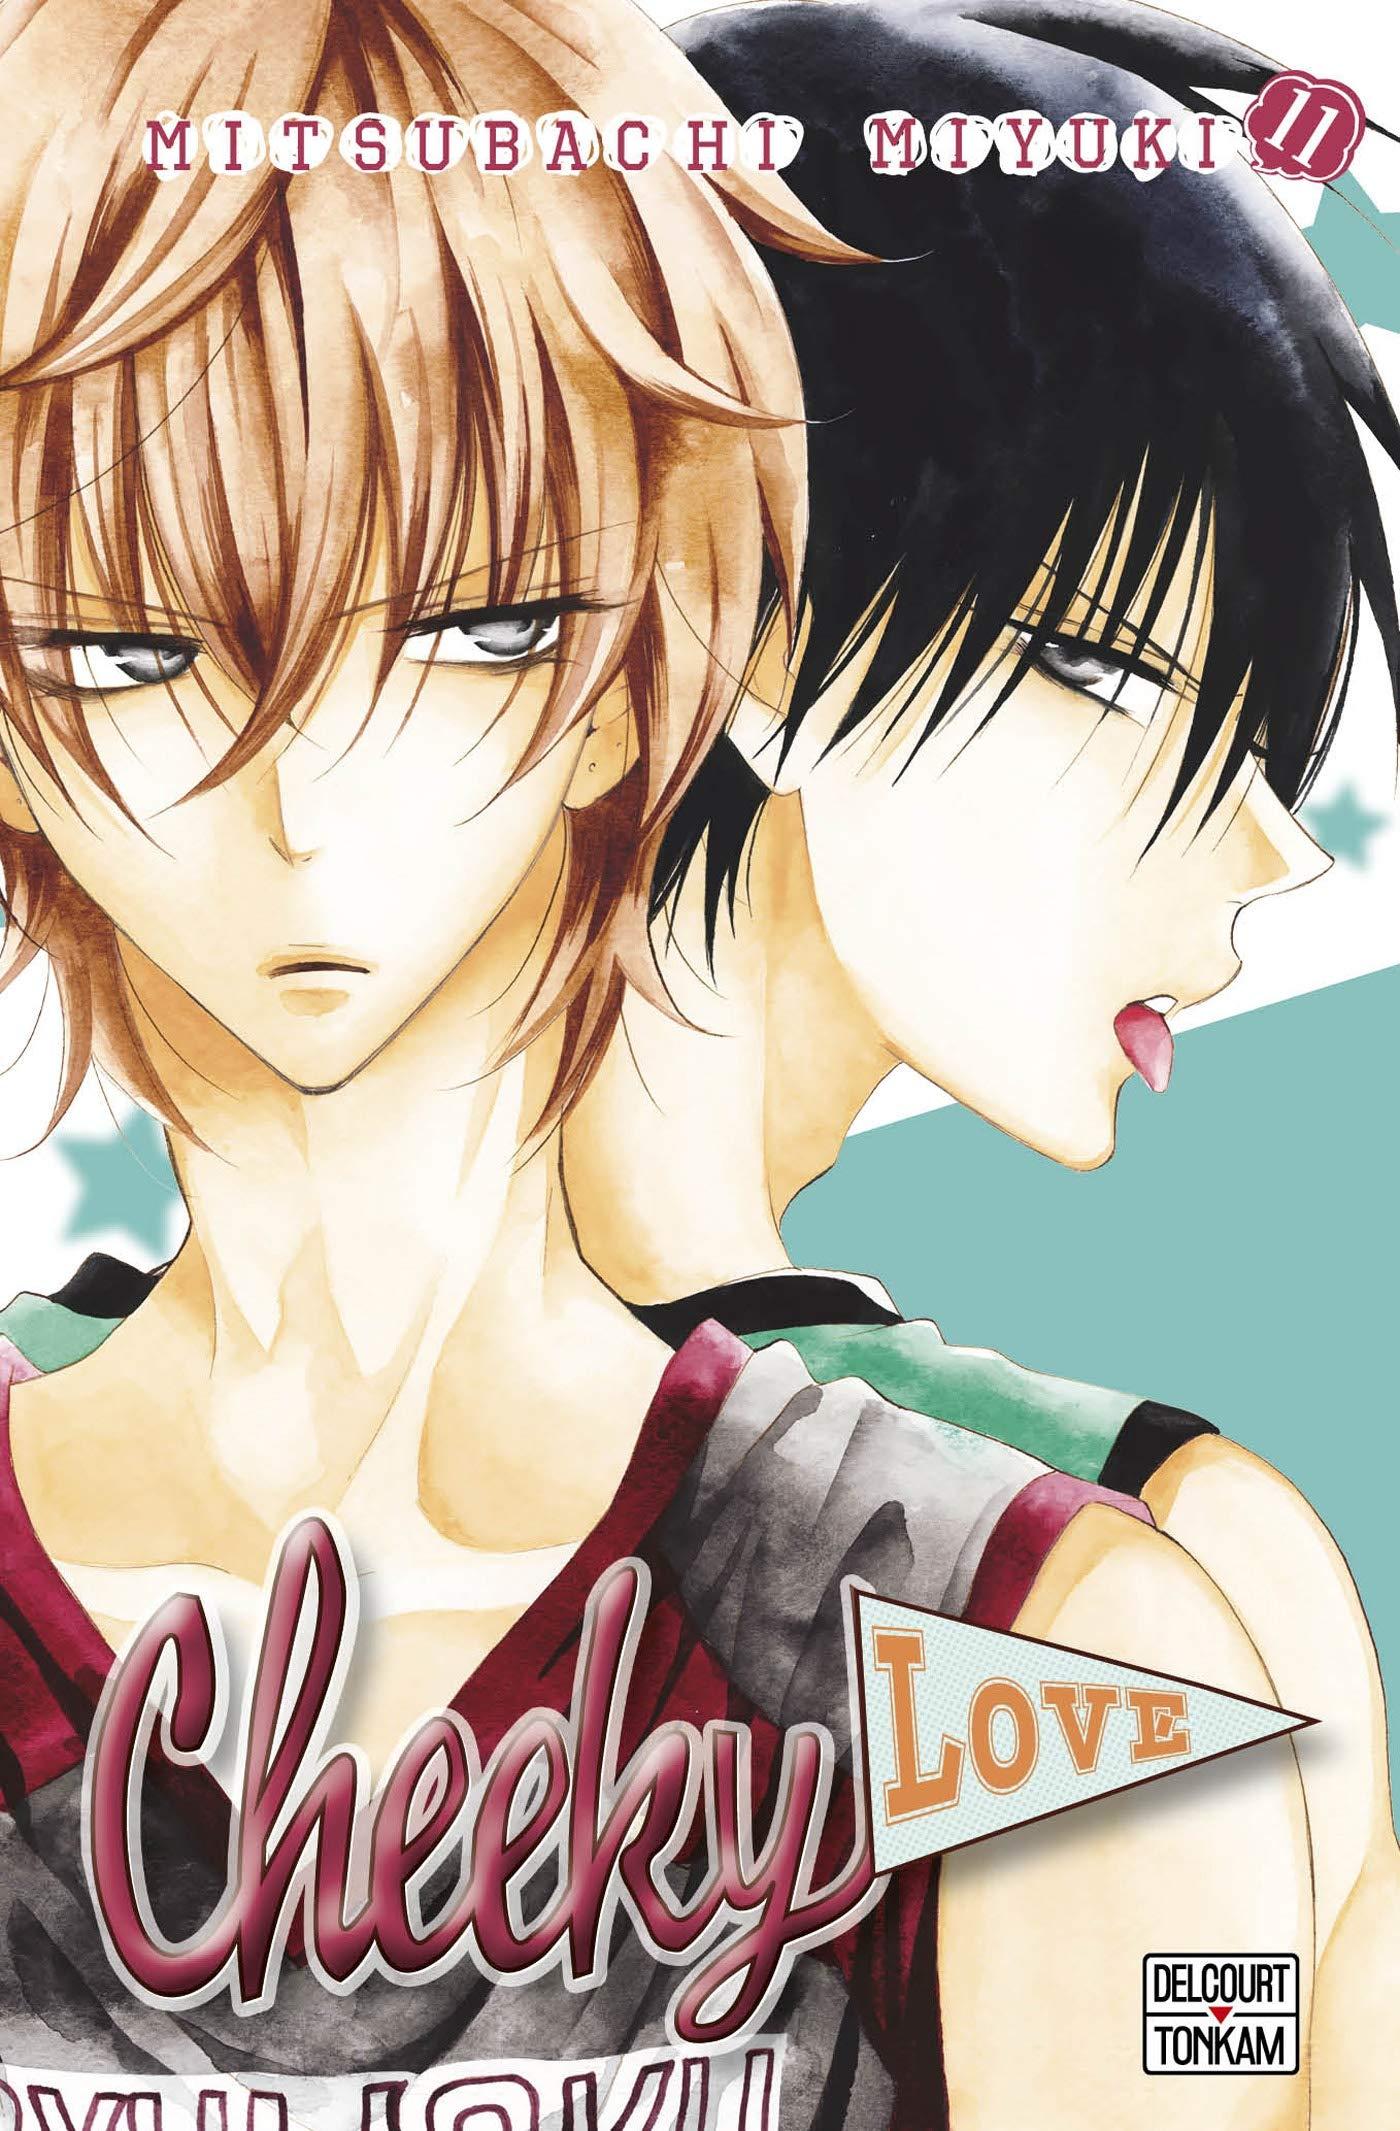 Cheeky love 11